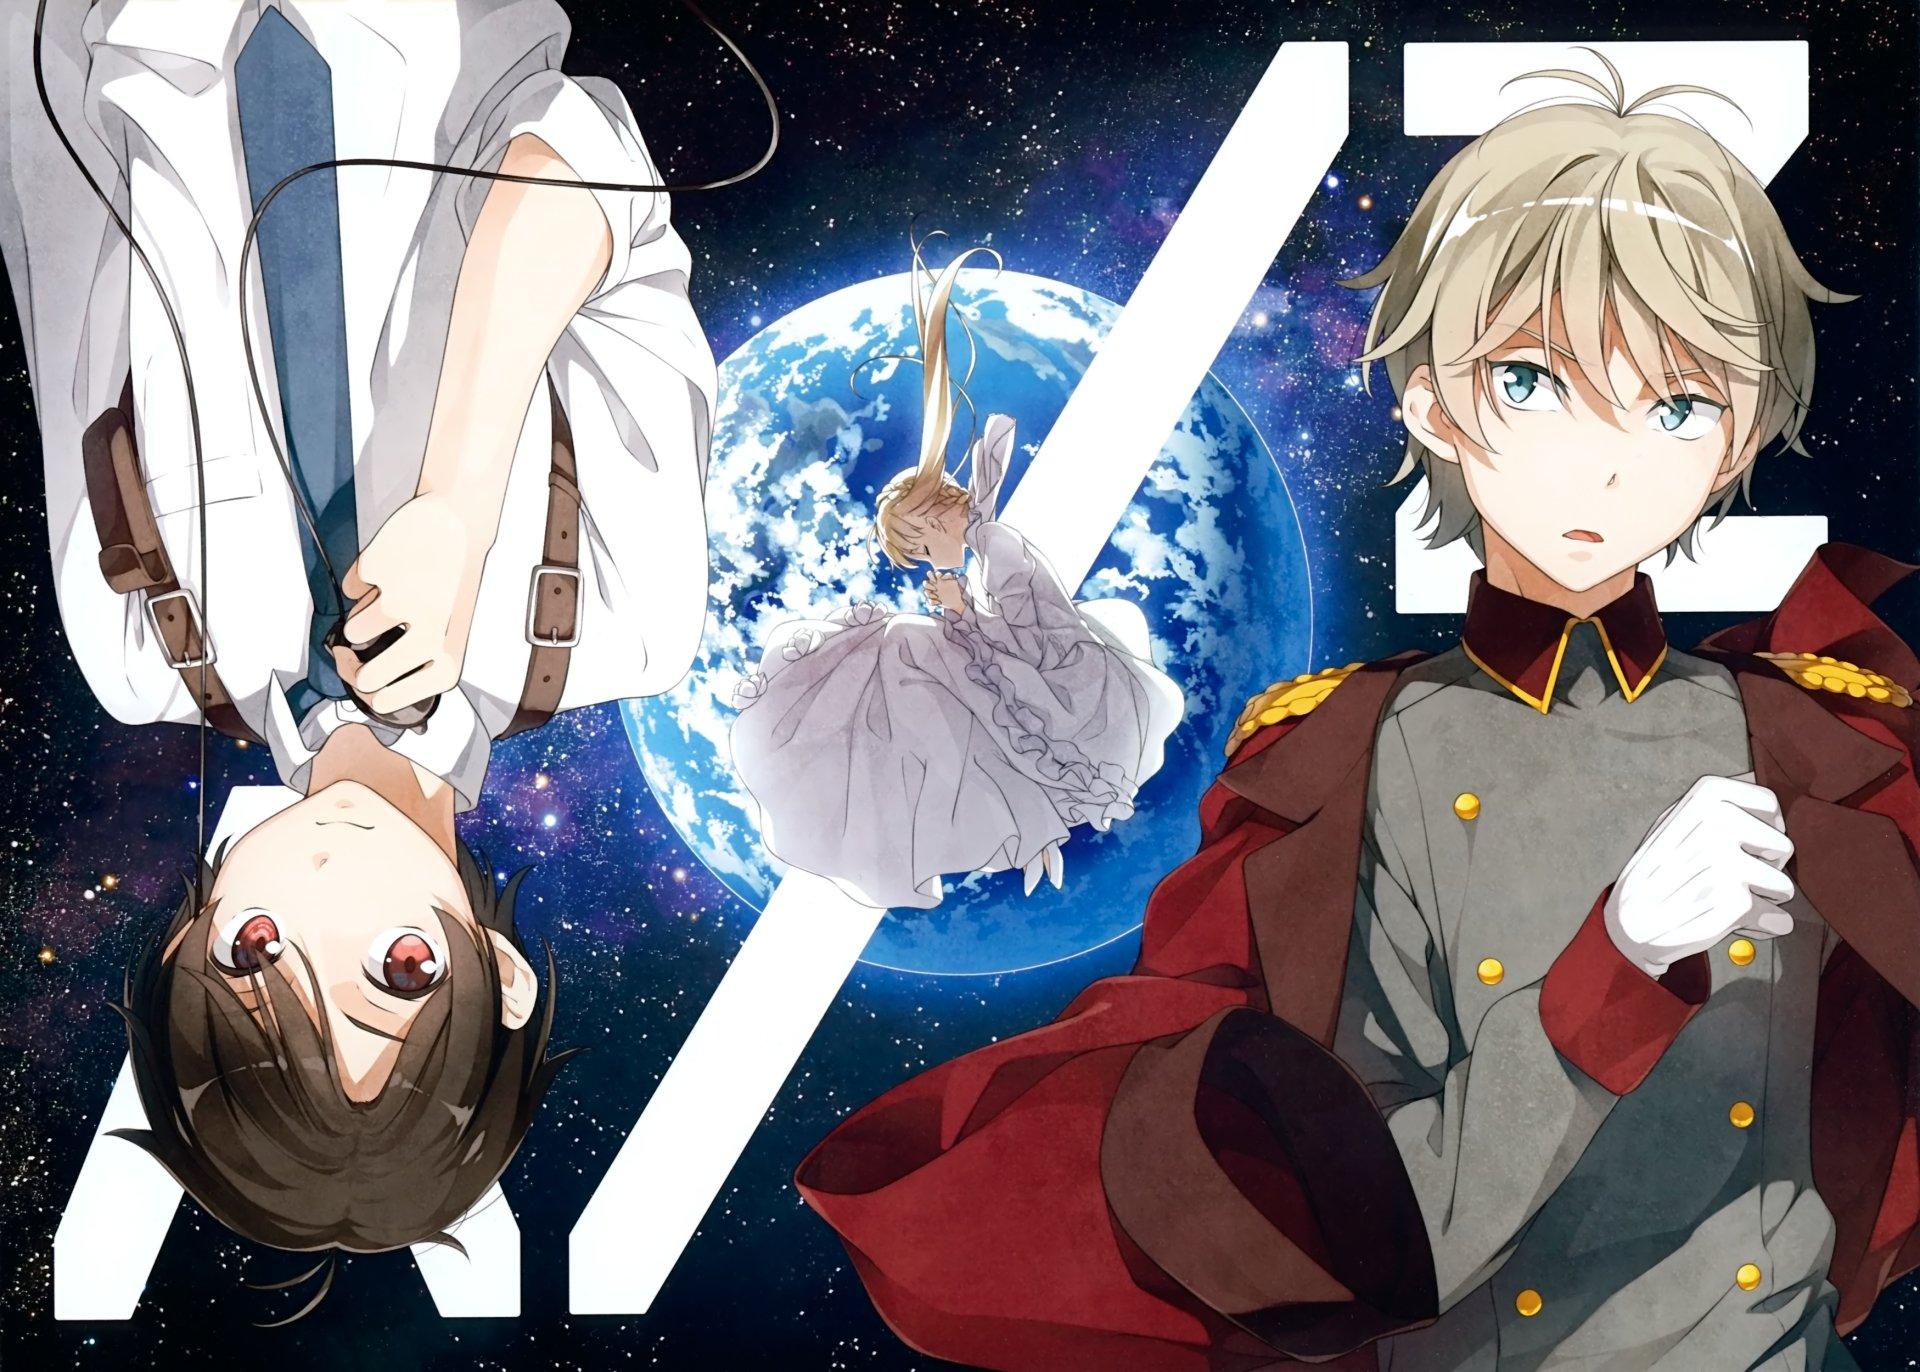 Anime - Aldnoah.Zero  Asseylum Vers Allusia Inaho Kaizuka Slaine Troyard Wallpaper